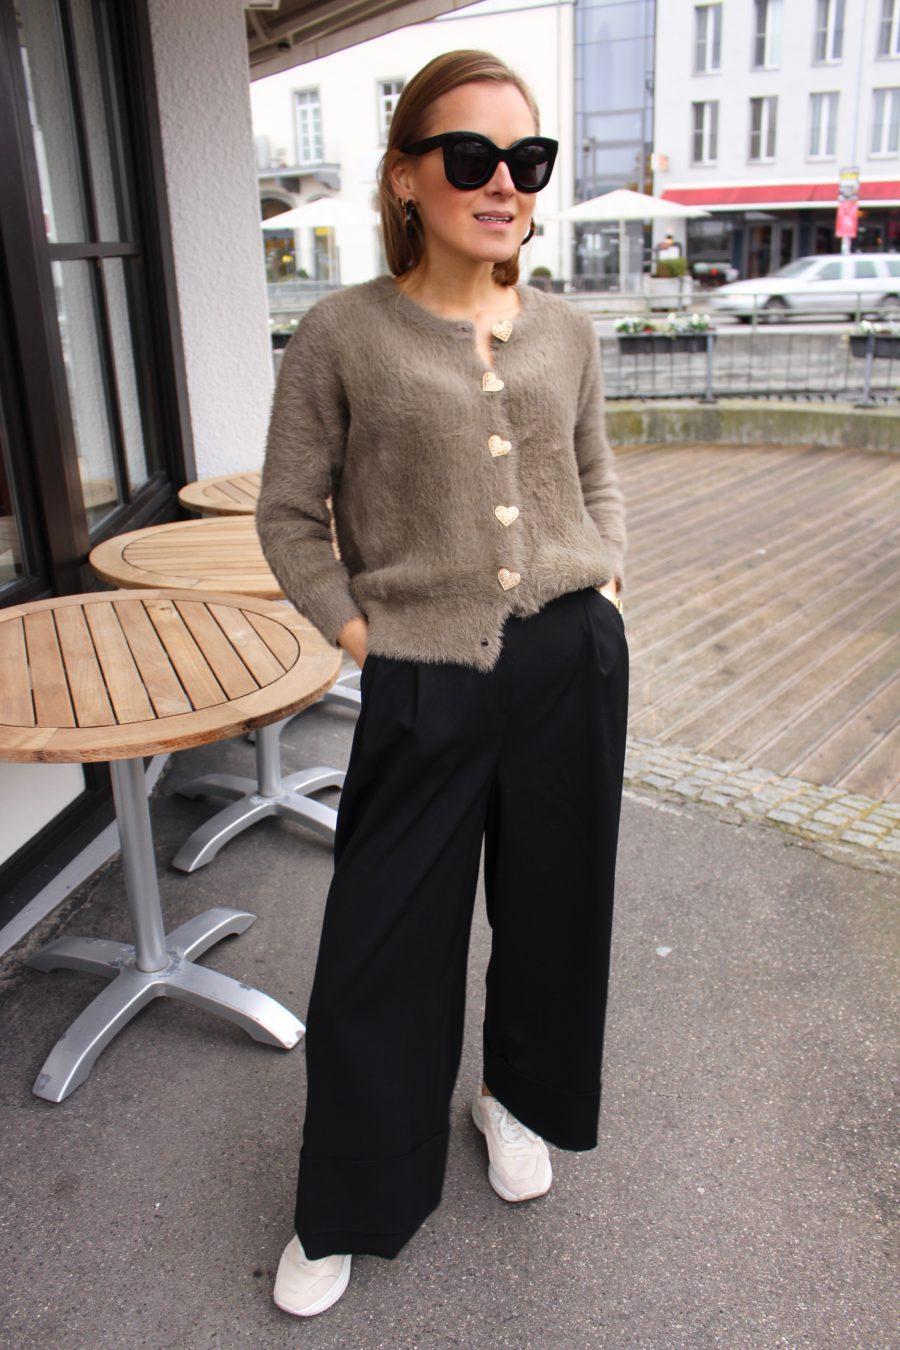 massimo dutti black trousers